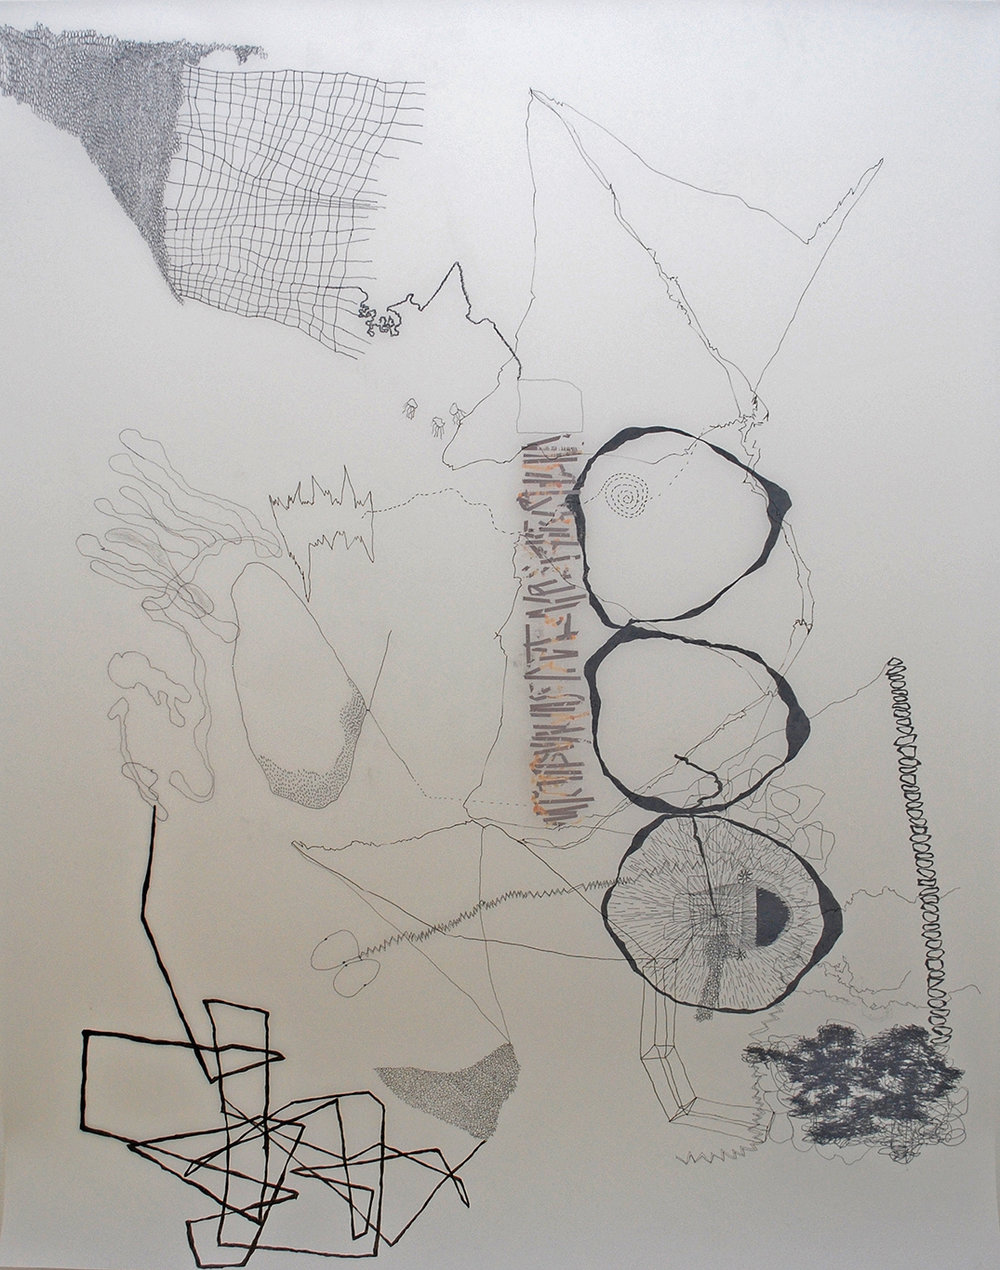 10Rerite drawing 2.jpg